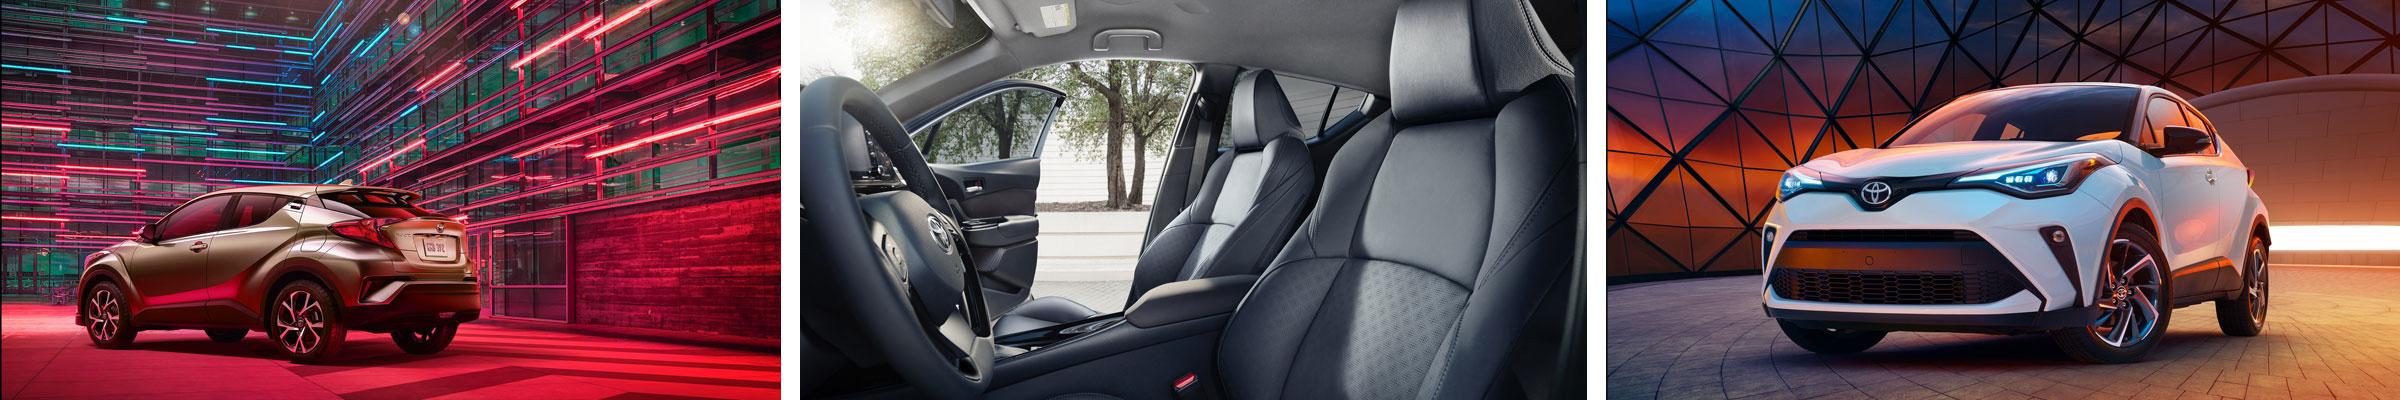 2021 Toyota C-HR For Sale Savannah GA   Chatham County